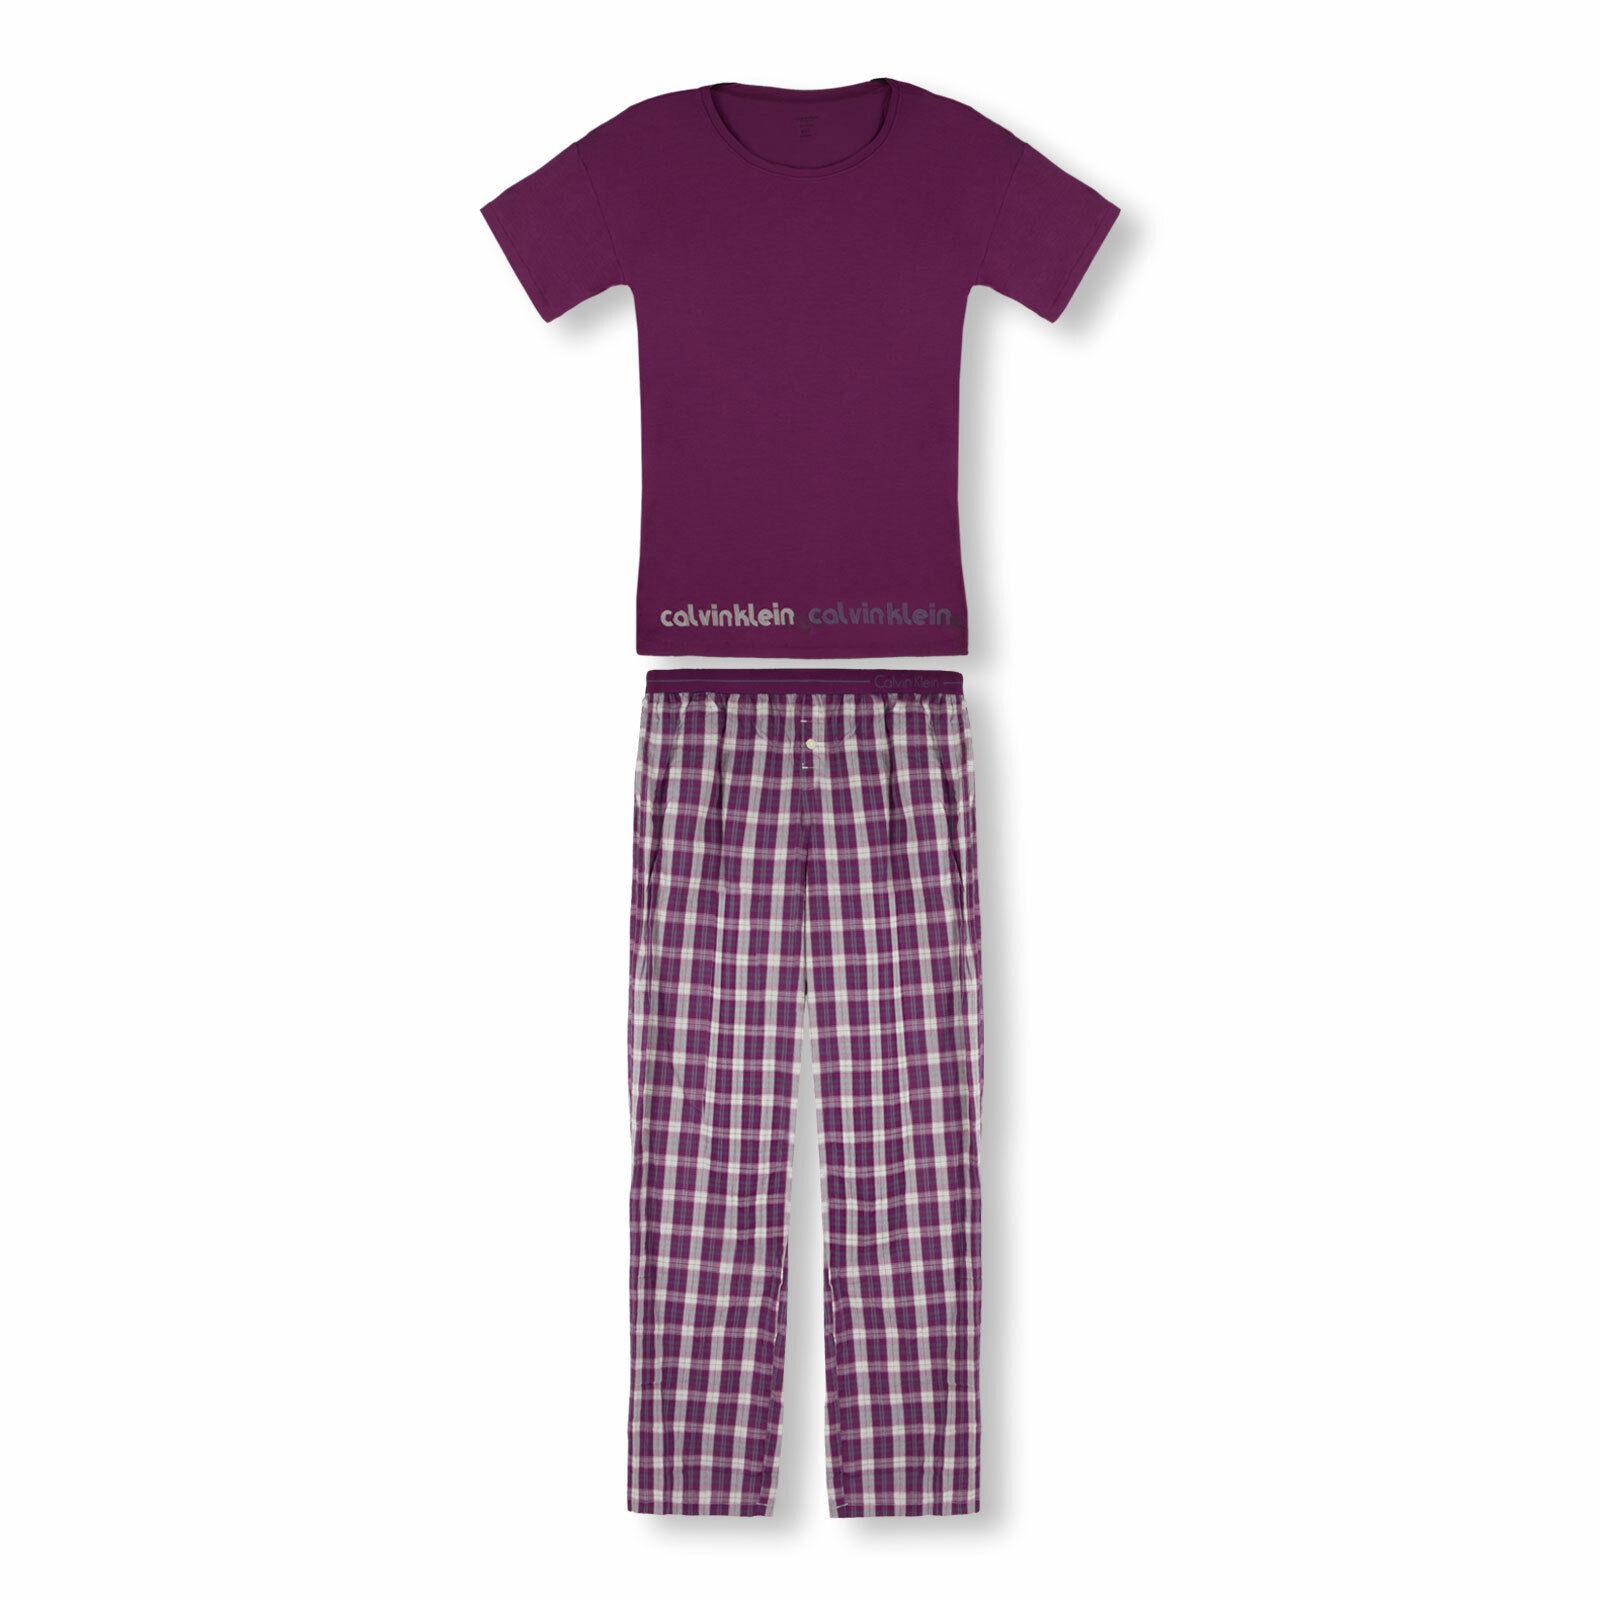 Calvin Klein Damen Pyjamaset lang Schlafanzug S M L